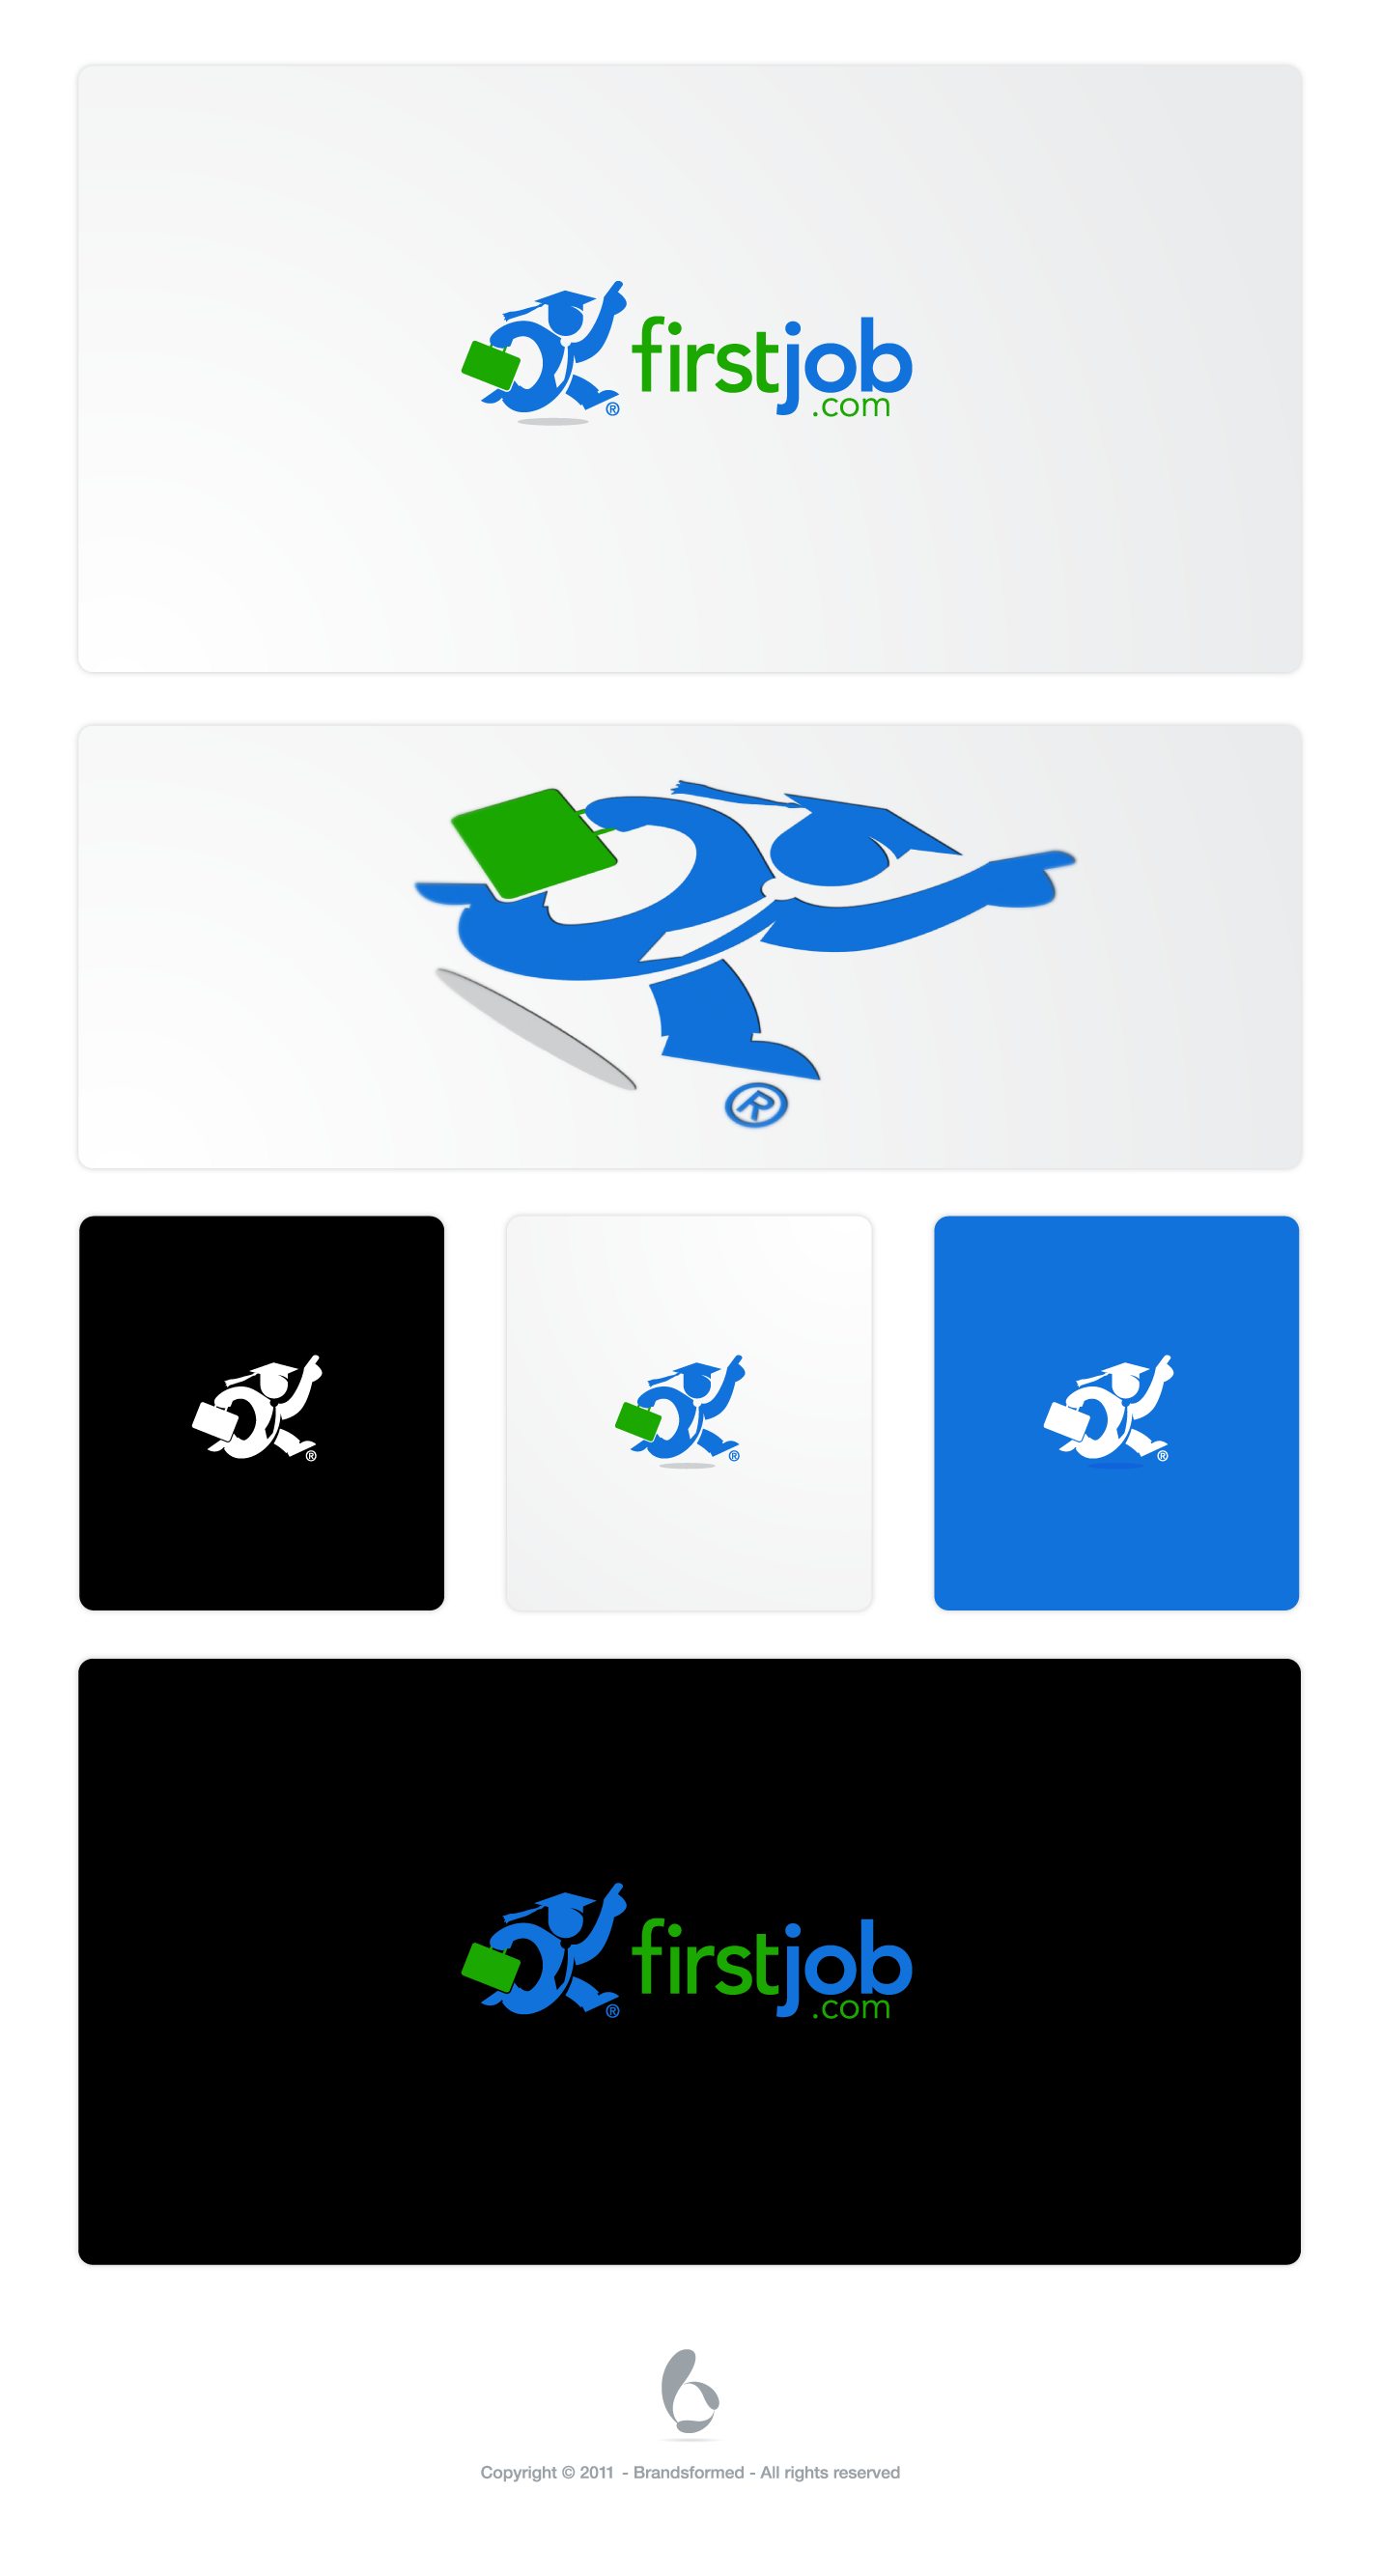 clean, simple, modern logo for firstjob.com